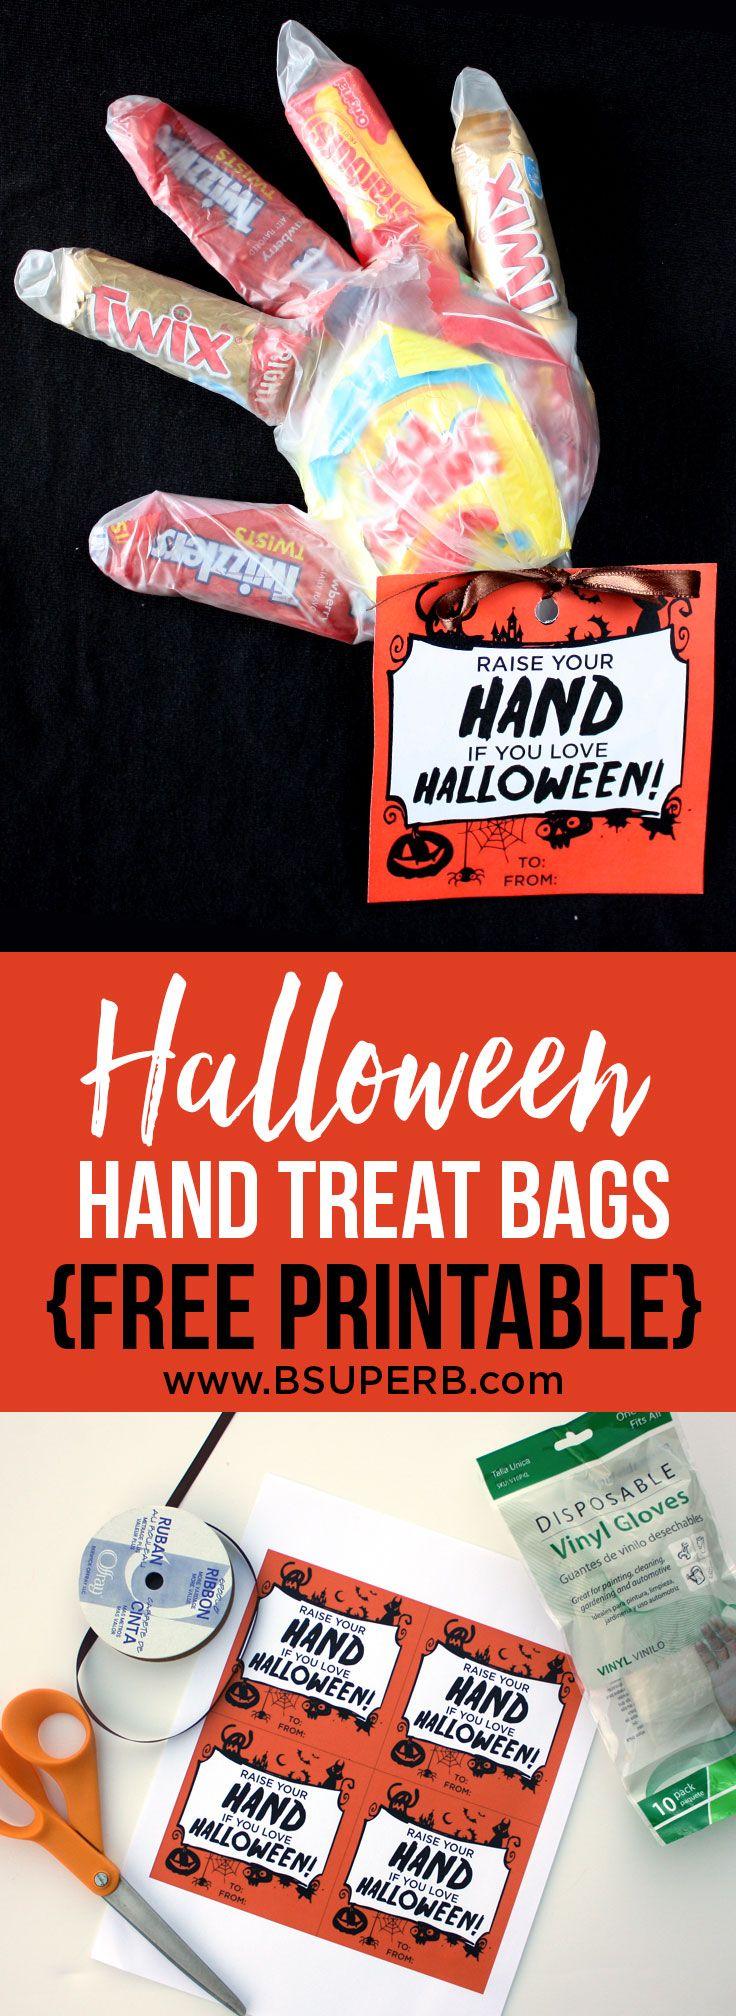 Halloween Hand Treat Bags {Free Printable Treat bags